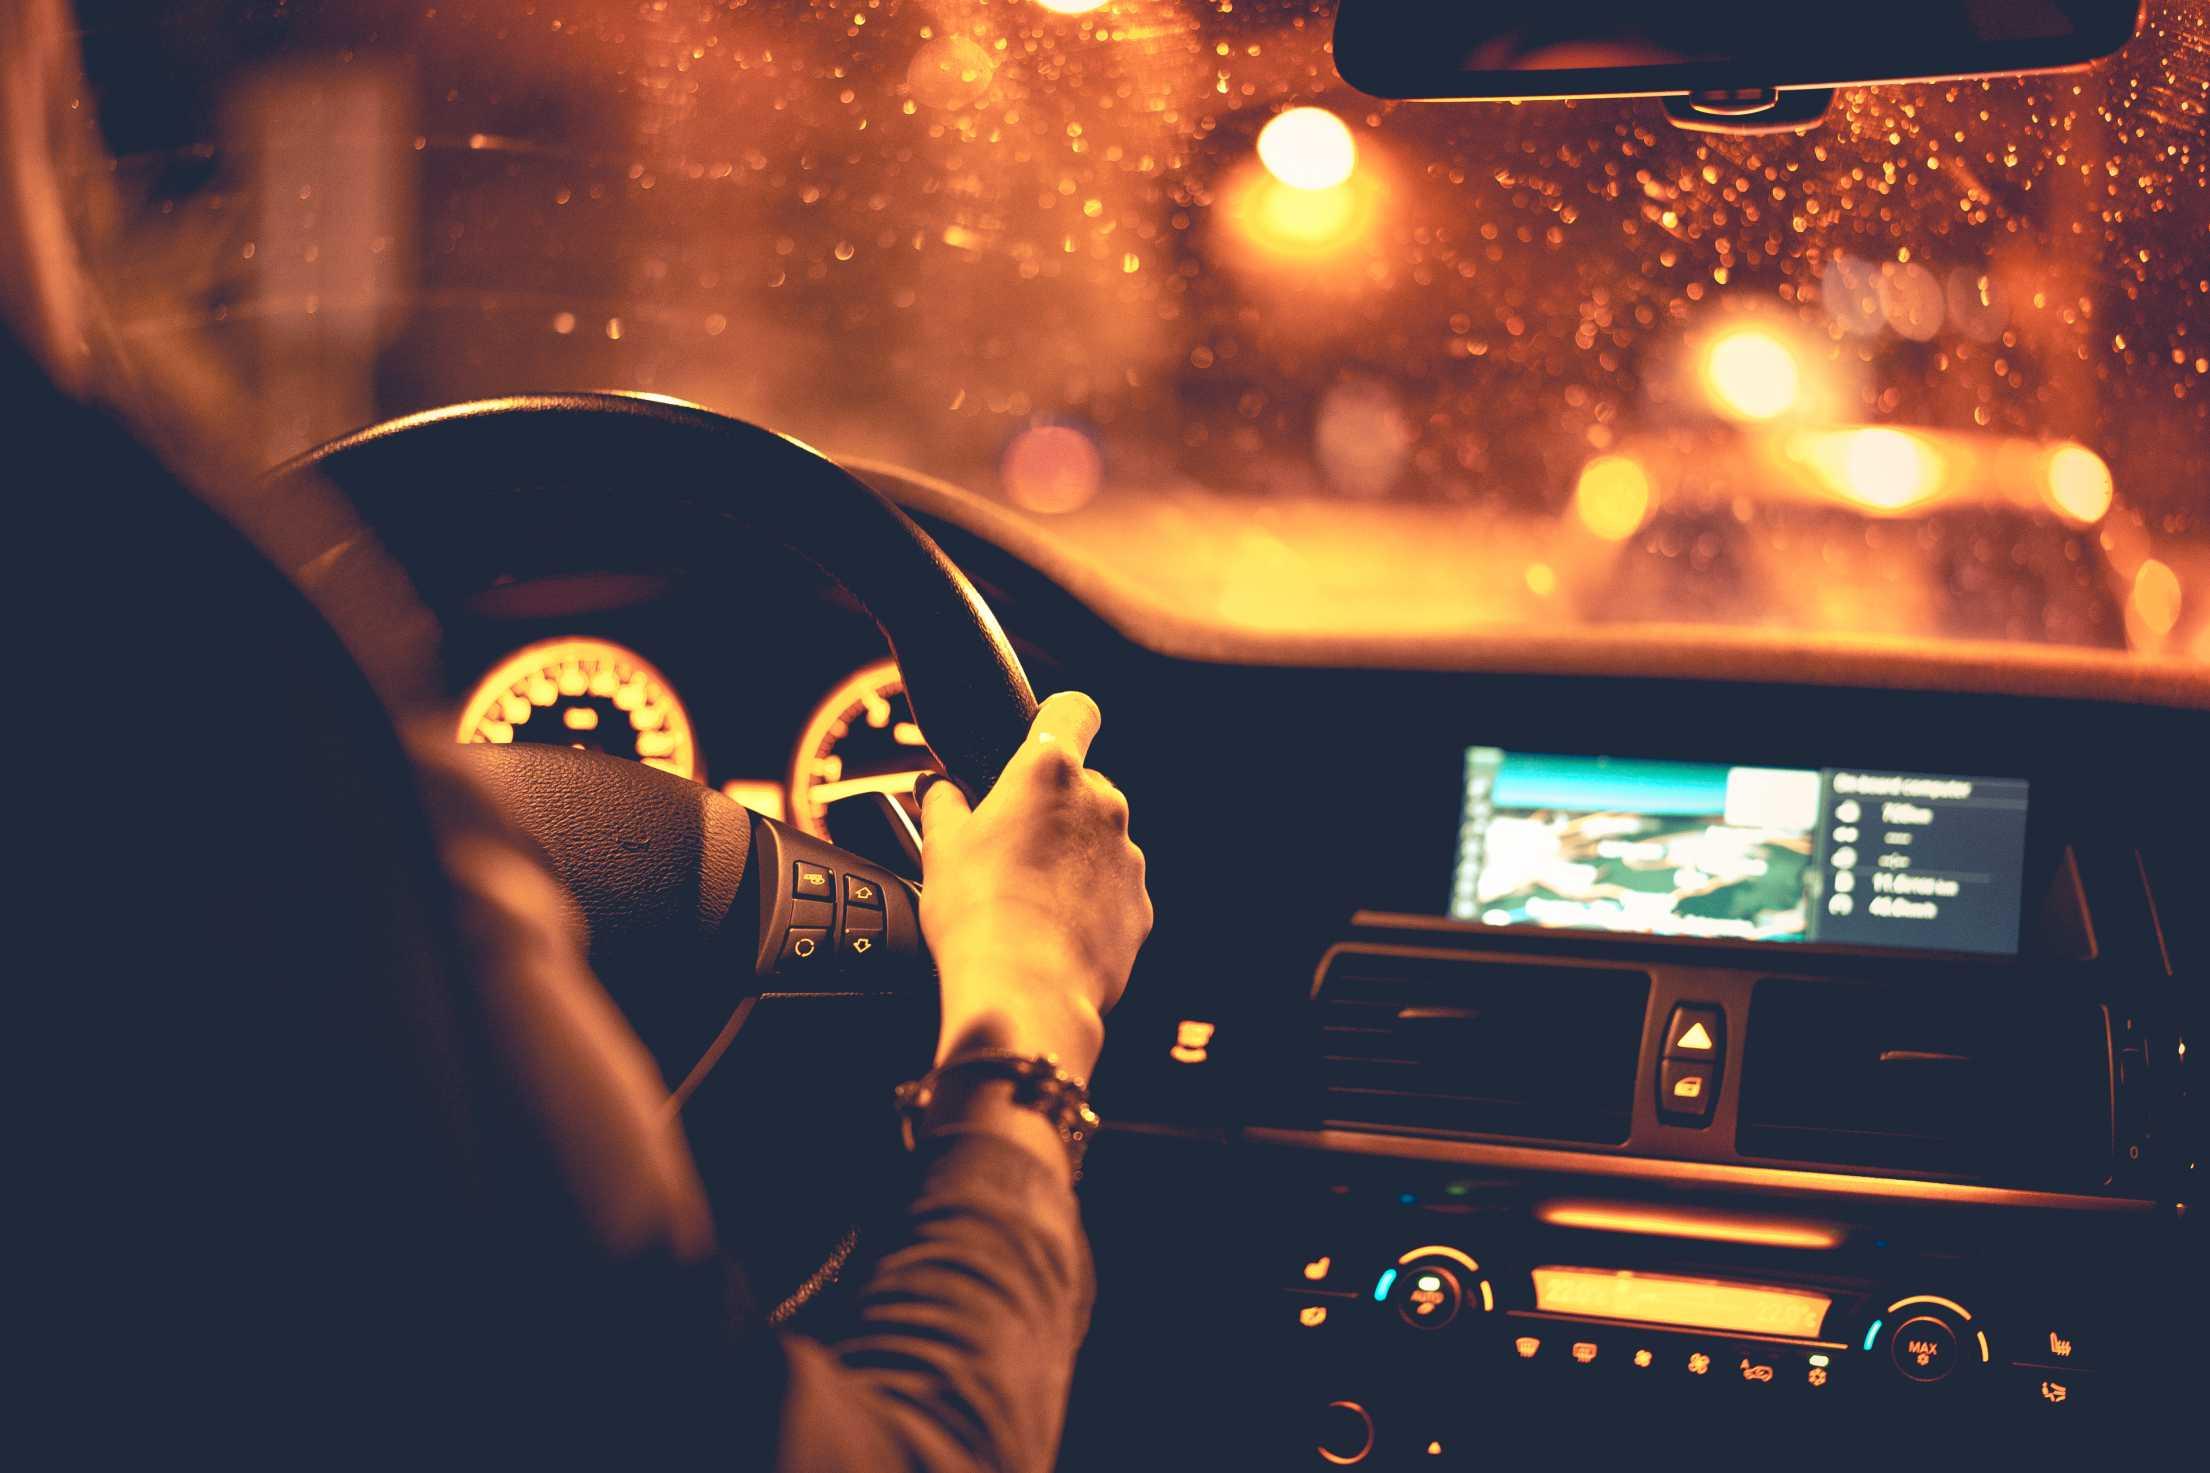 hands-driving-car-at-night.jpg